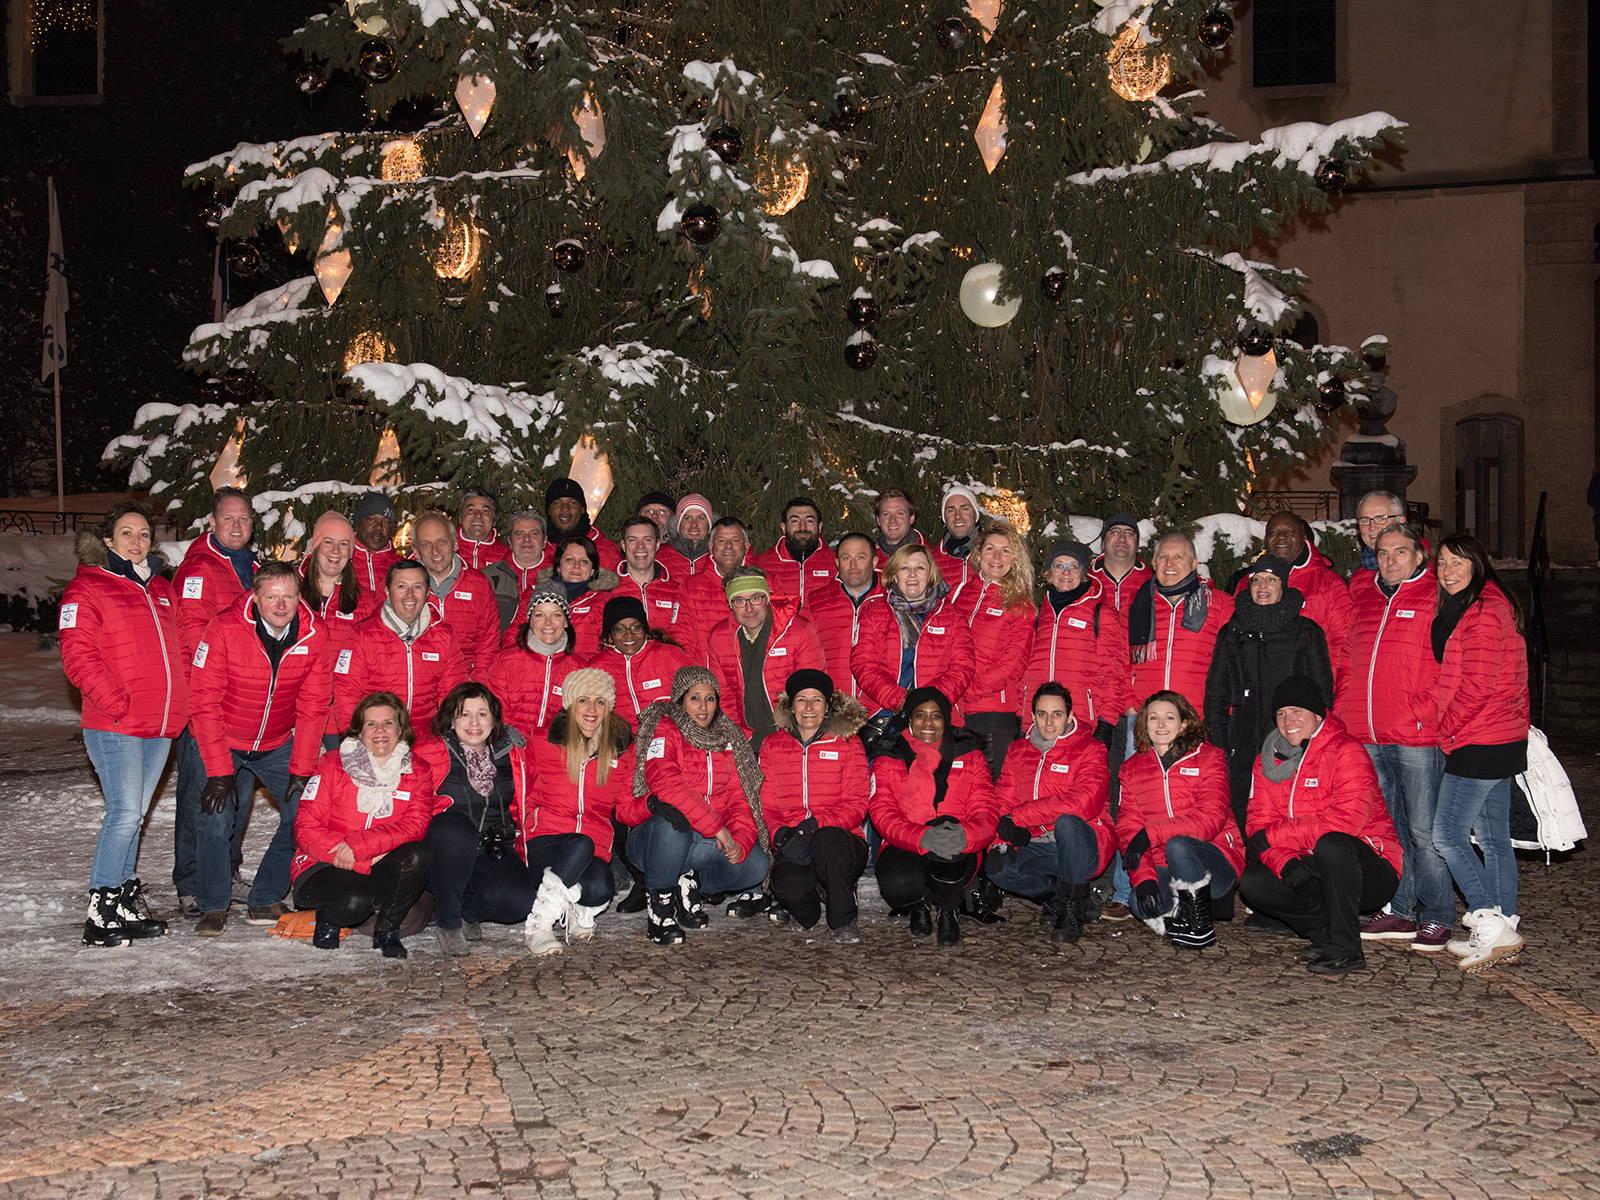 Leblanc Illuminations Christmas Export Team